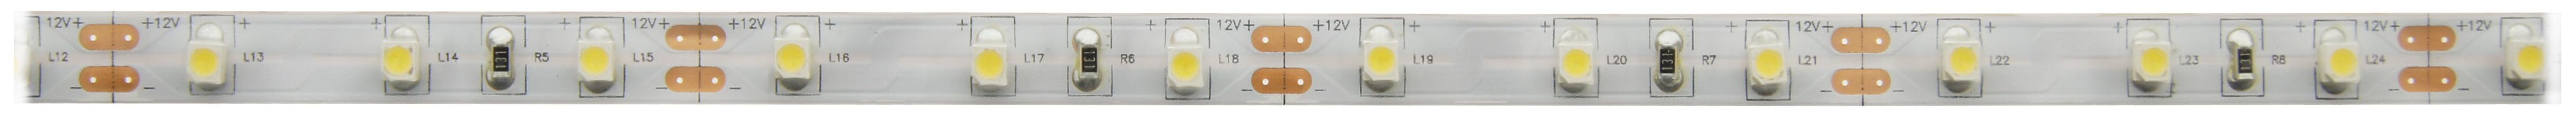 1 Stk FS 24, UWW, Ra=90+, 7W/m, 520lm/m, 12VDC, IP44, l=5m LIFS001001